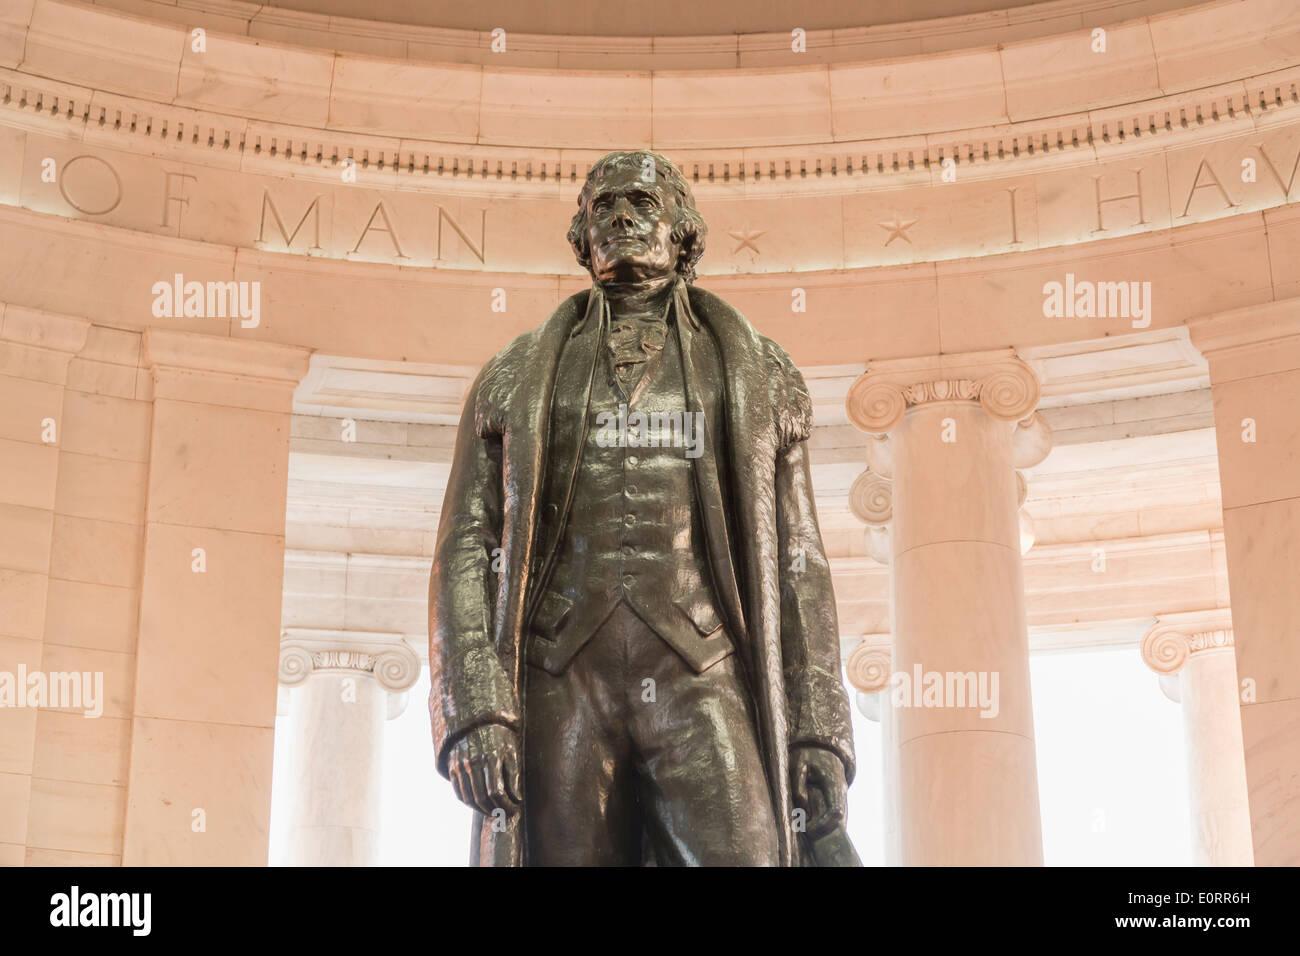 Thomas Jefferson statue in the Jefferson Memorial, Washington DC, USA Stock Photo